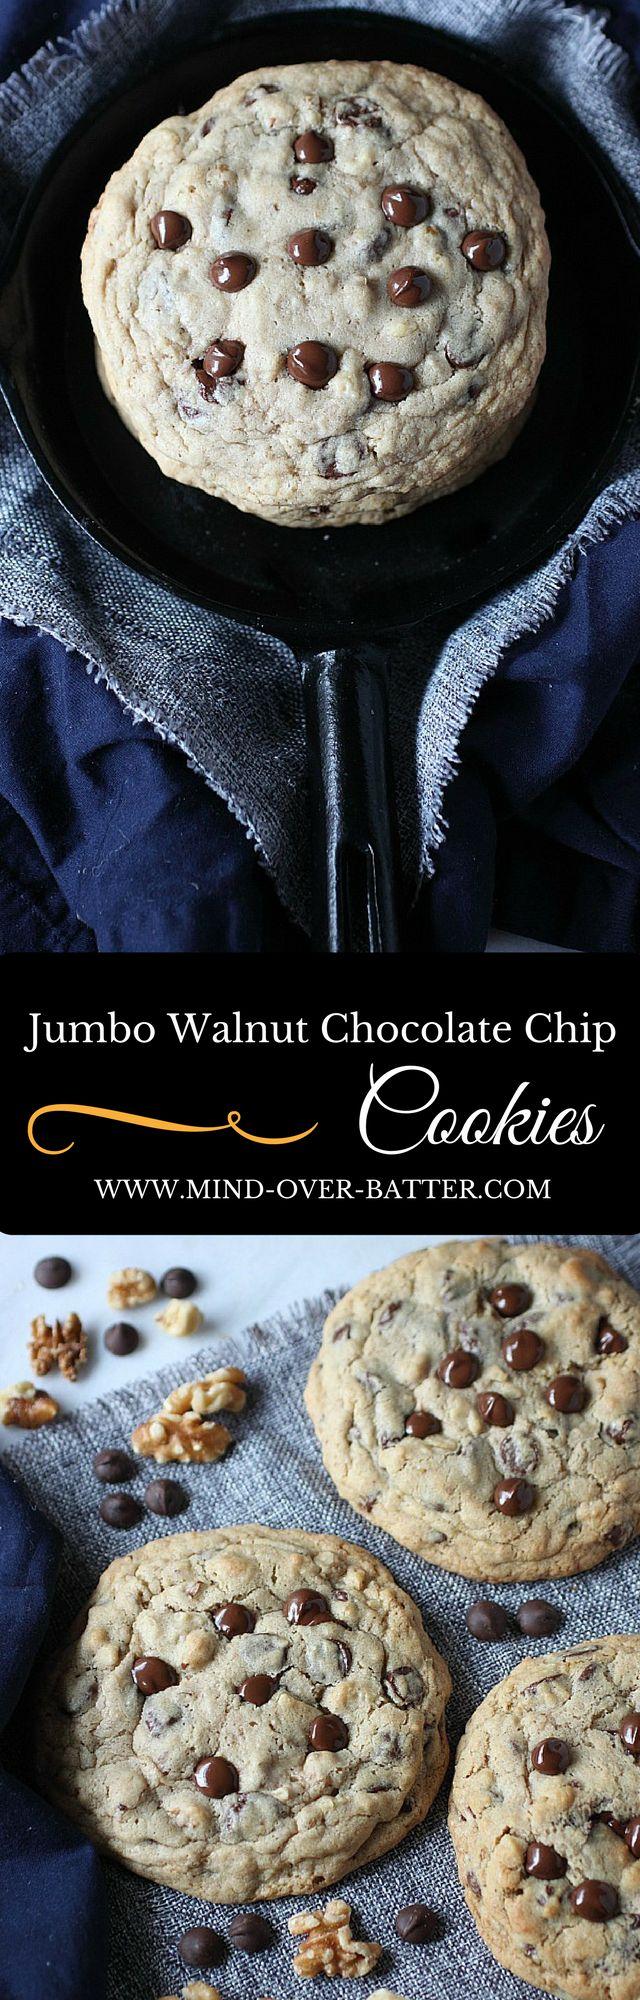 Jumbo Walnut Chocolate Chip Cookies -- www.mind-over-batter.com